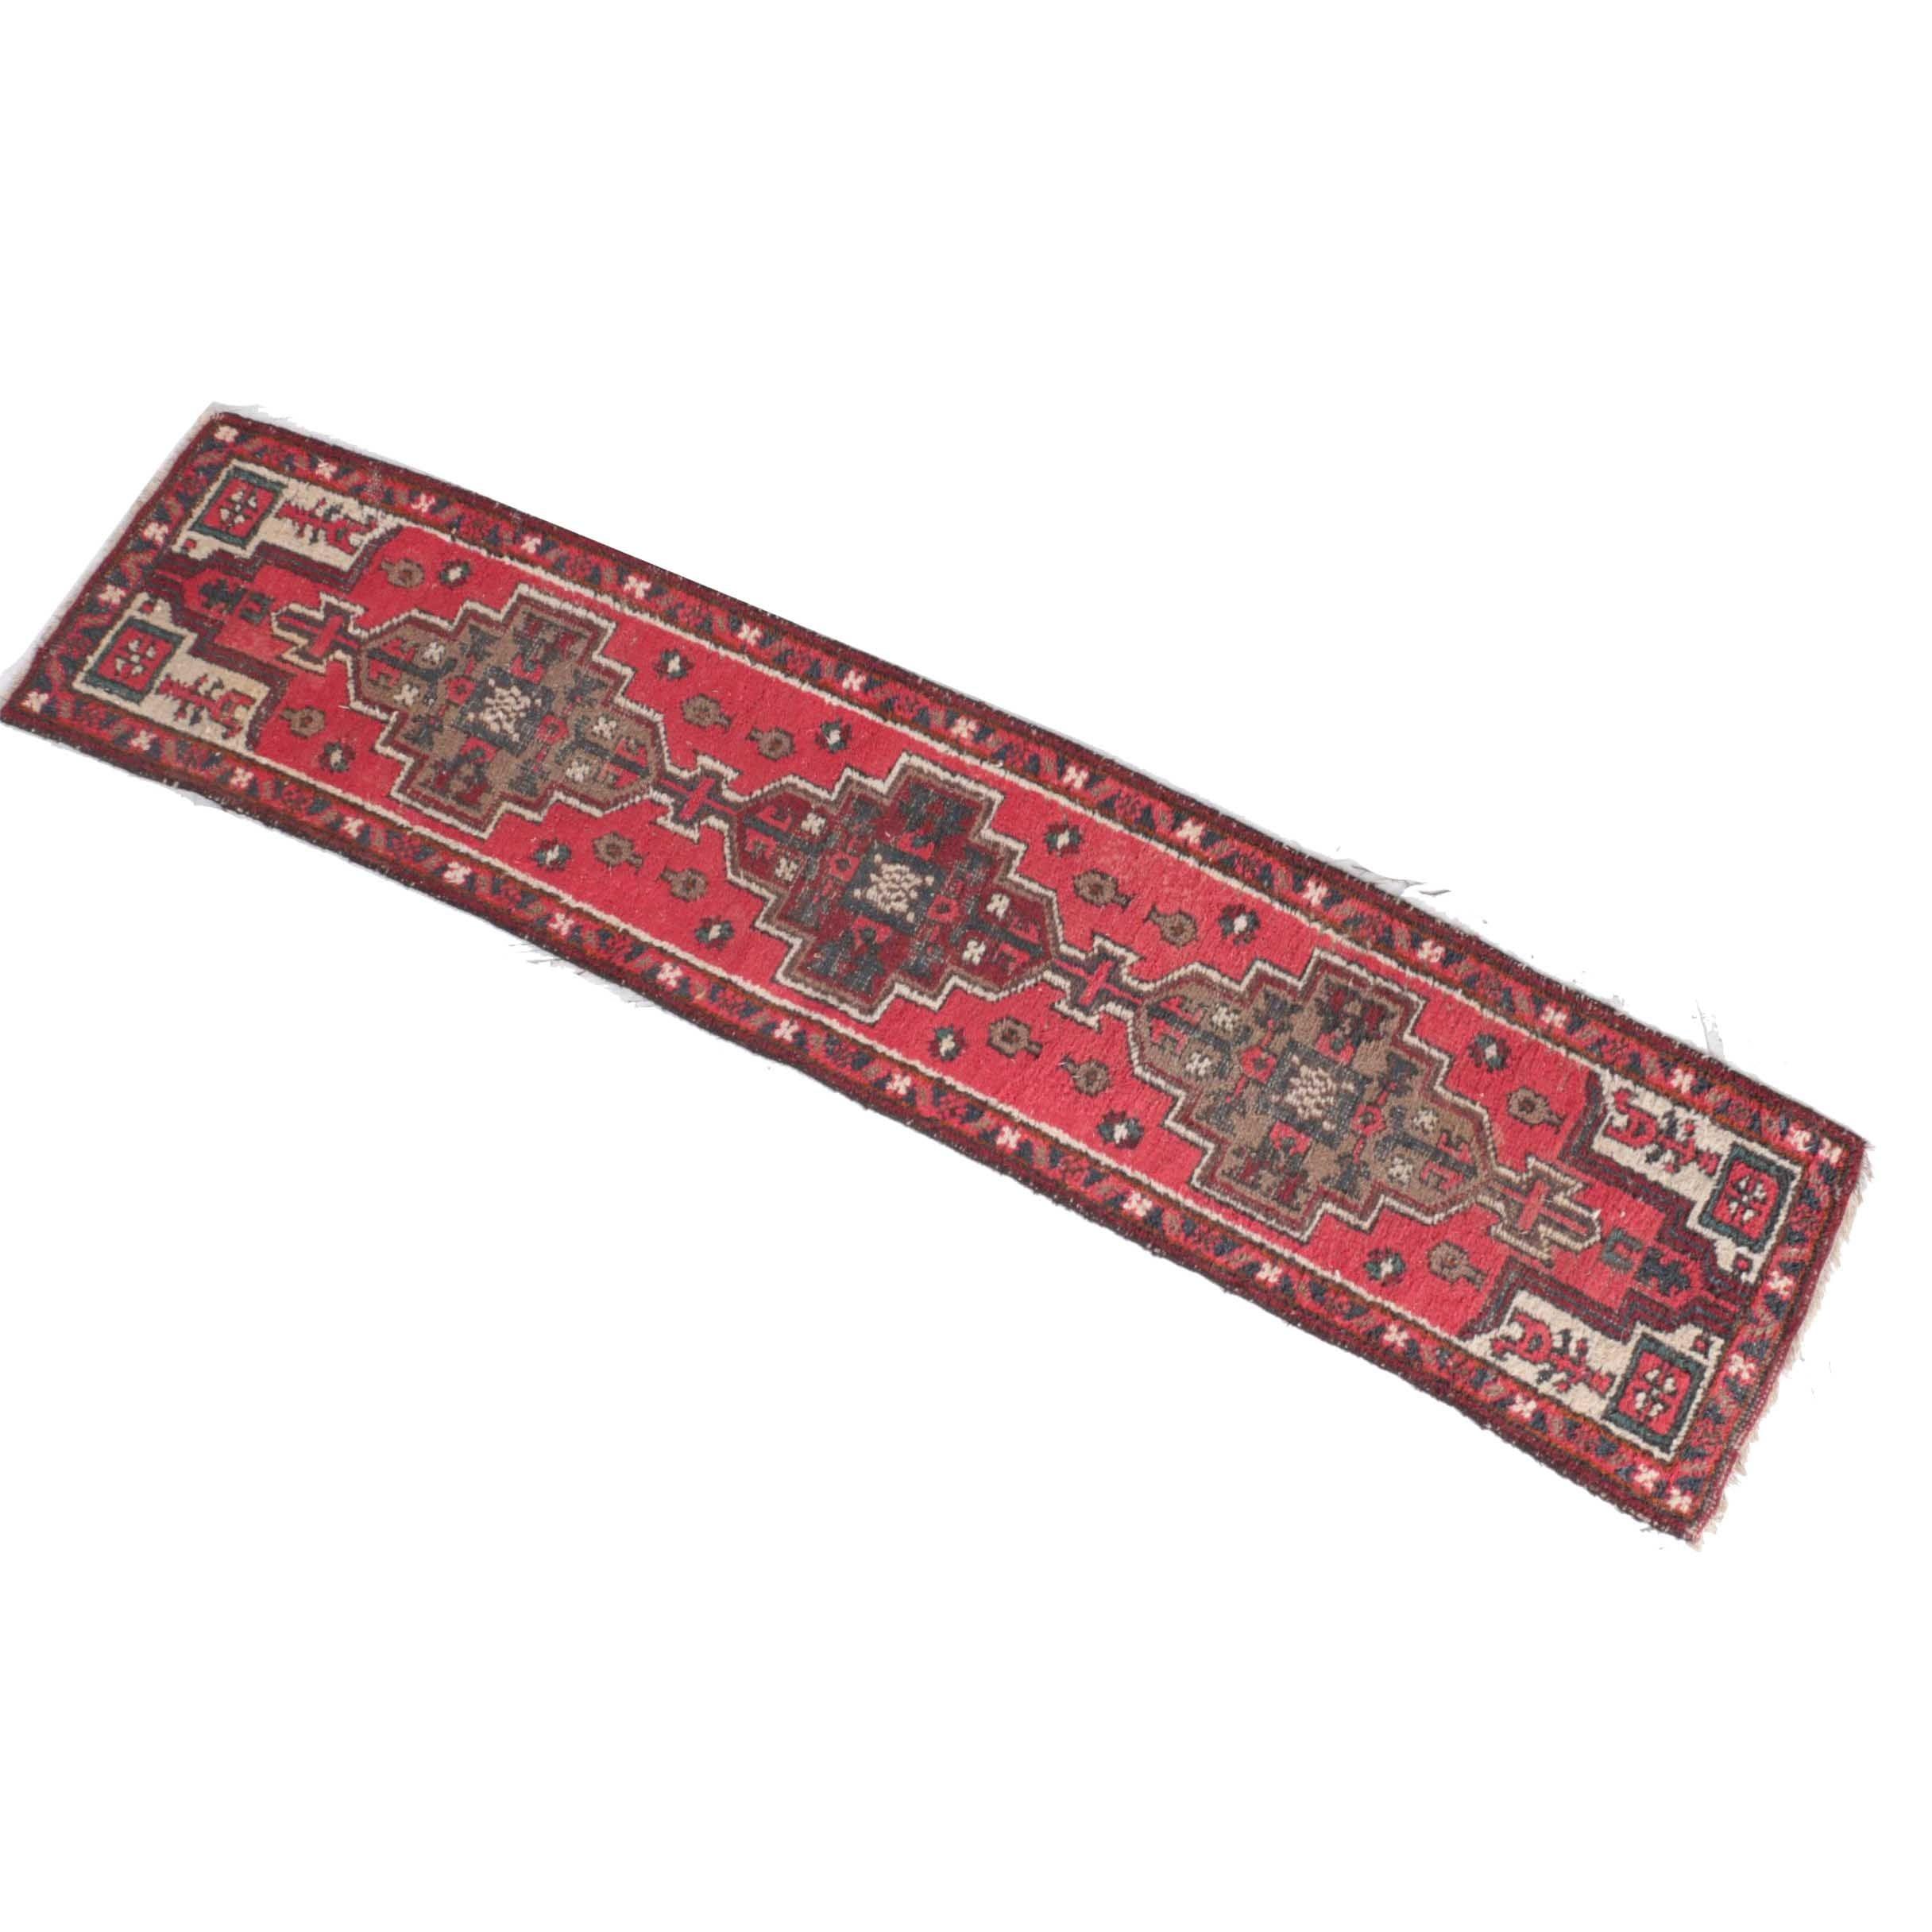 Semi-Antique Central Asian Carpet Runner